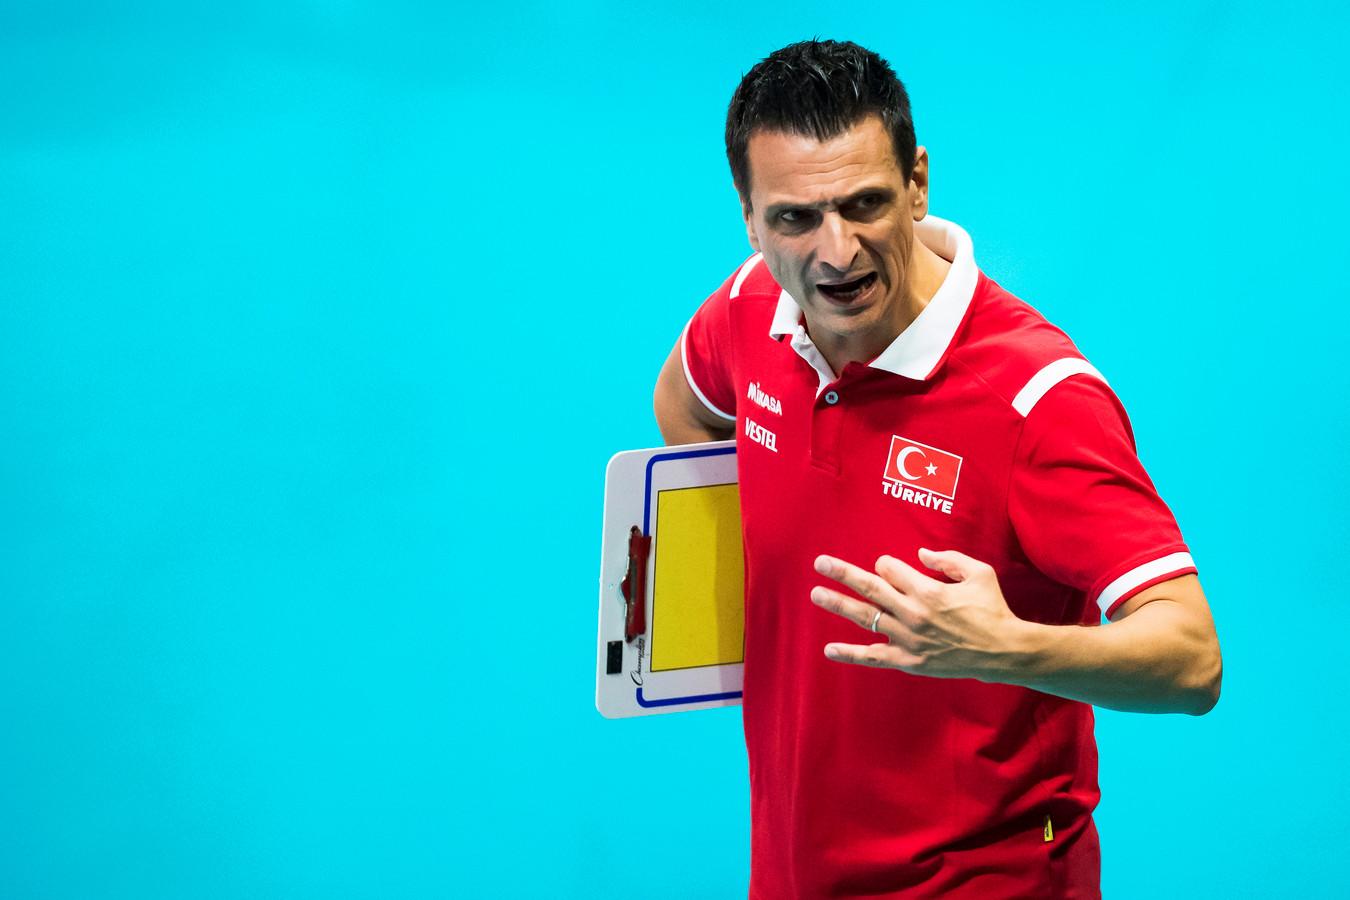 Giovanni Guidetti is tegenwoordig bondscoach van Turkije.